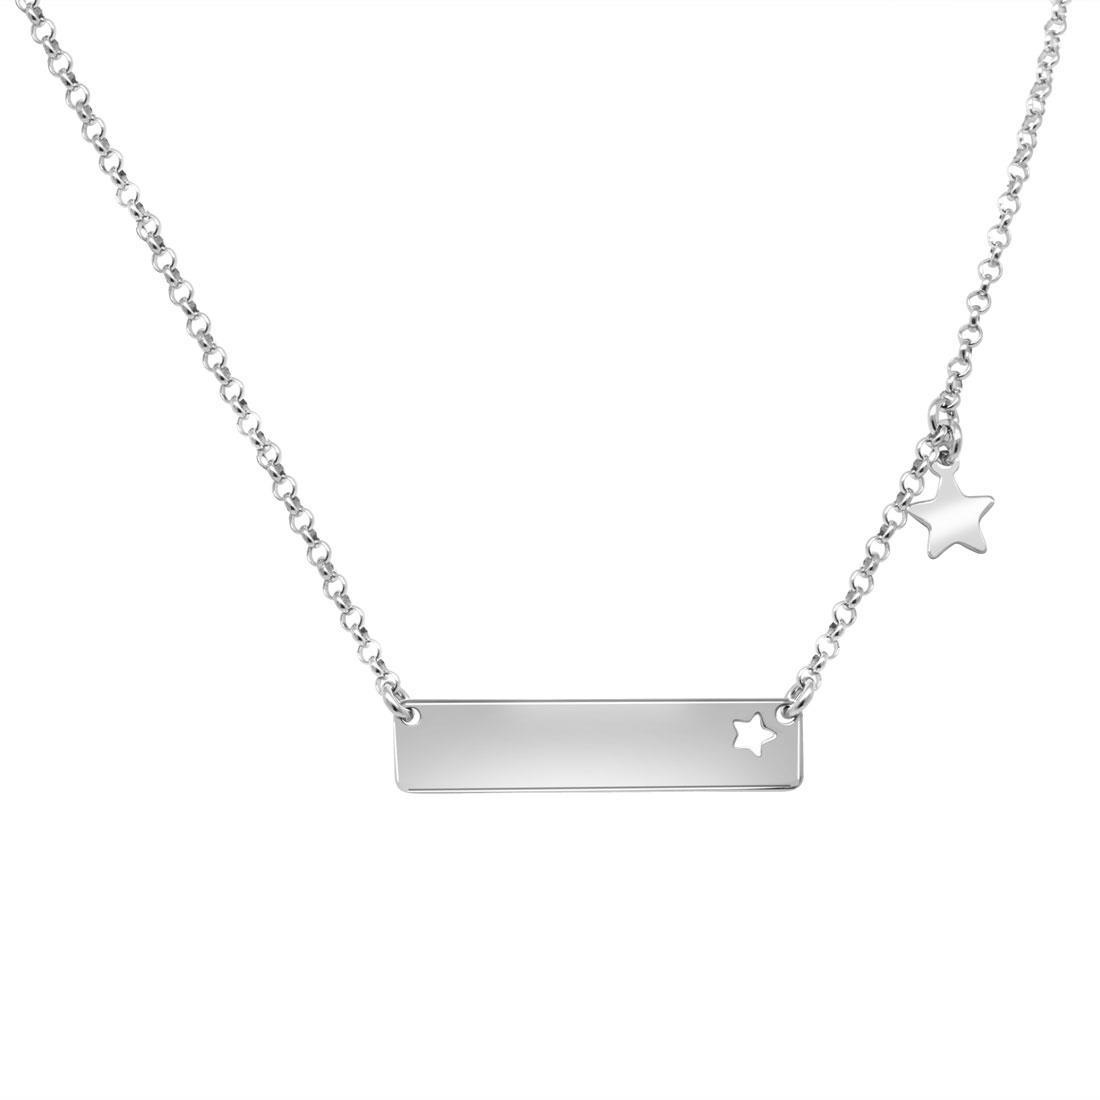 Collana in argento con targhetta - ORO&CO 925